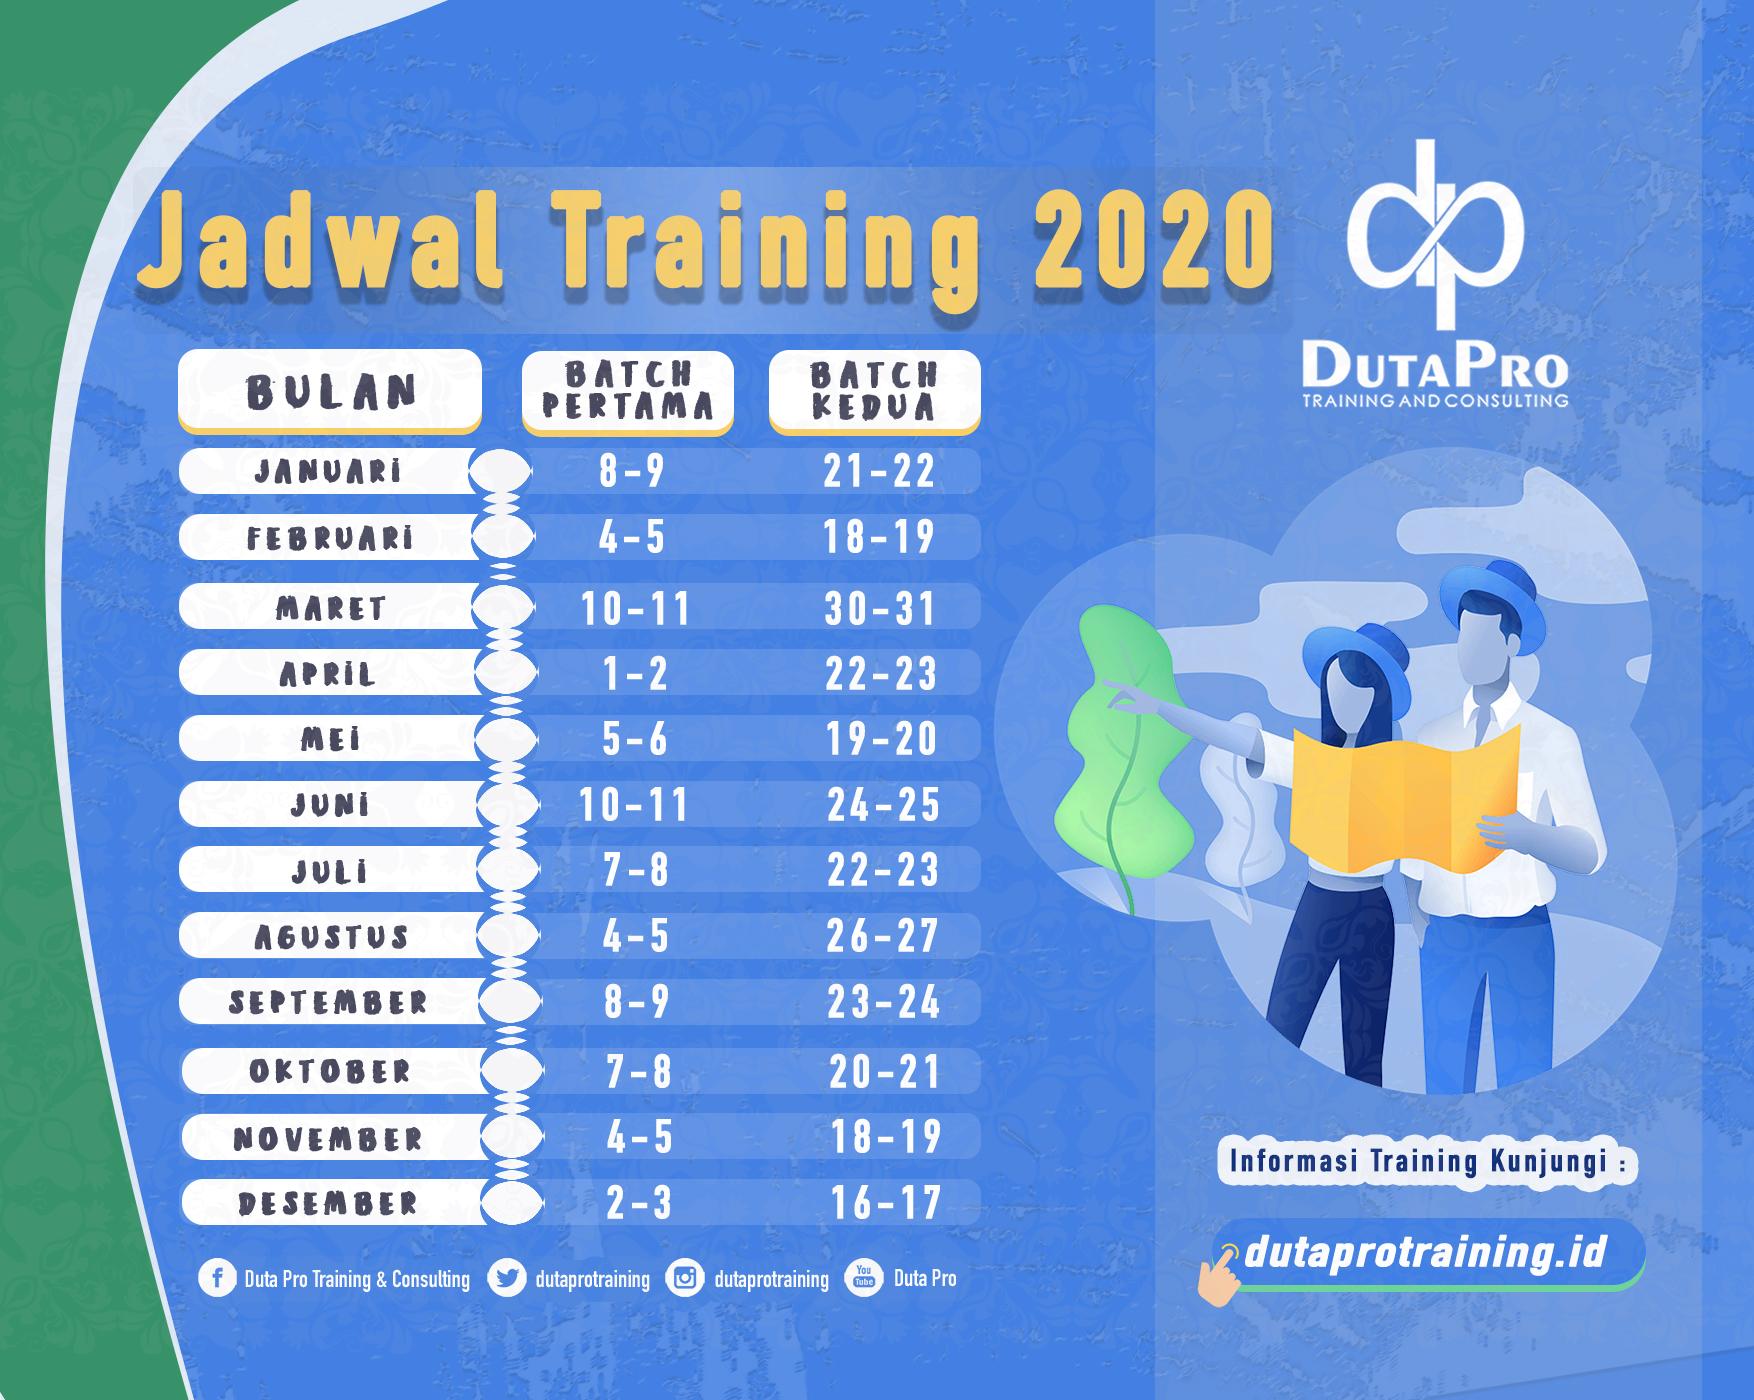 Jadwal Training SDM Duta pro Jogja bandung bali